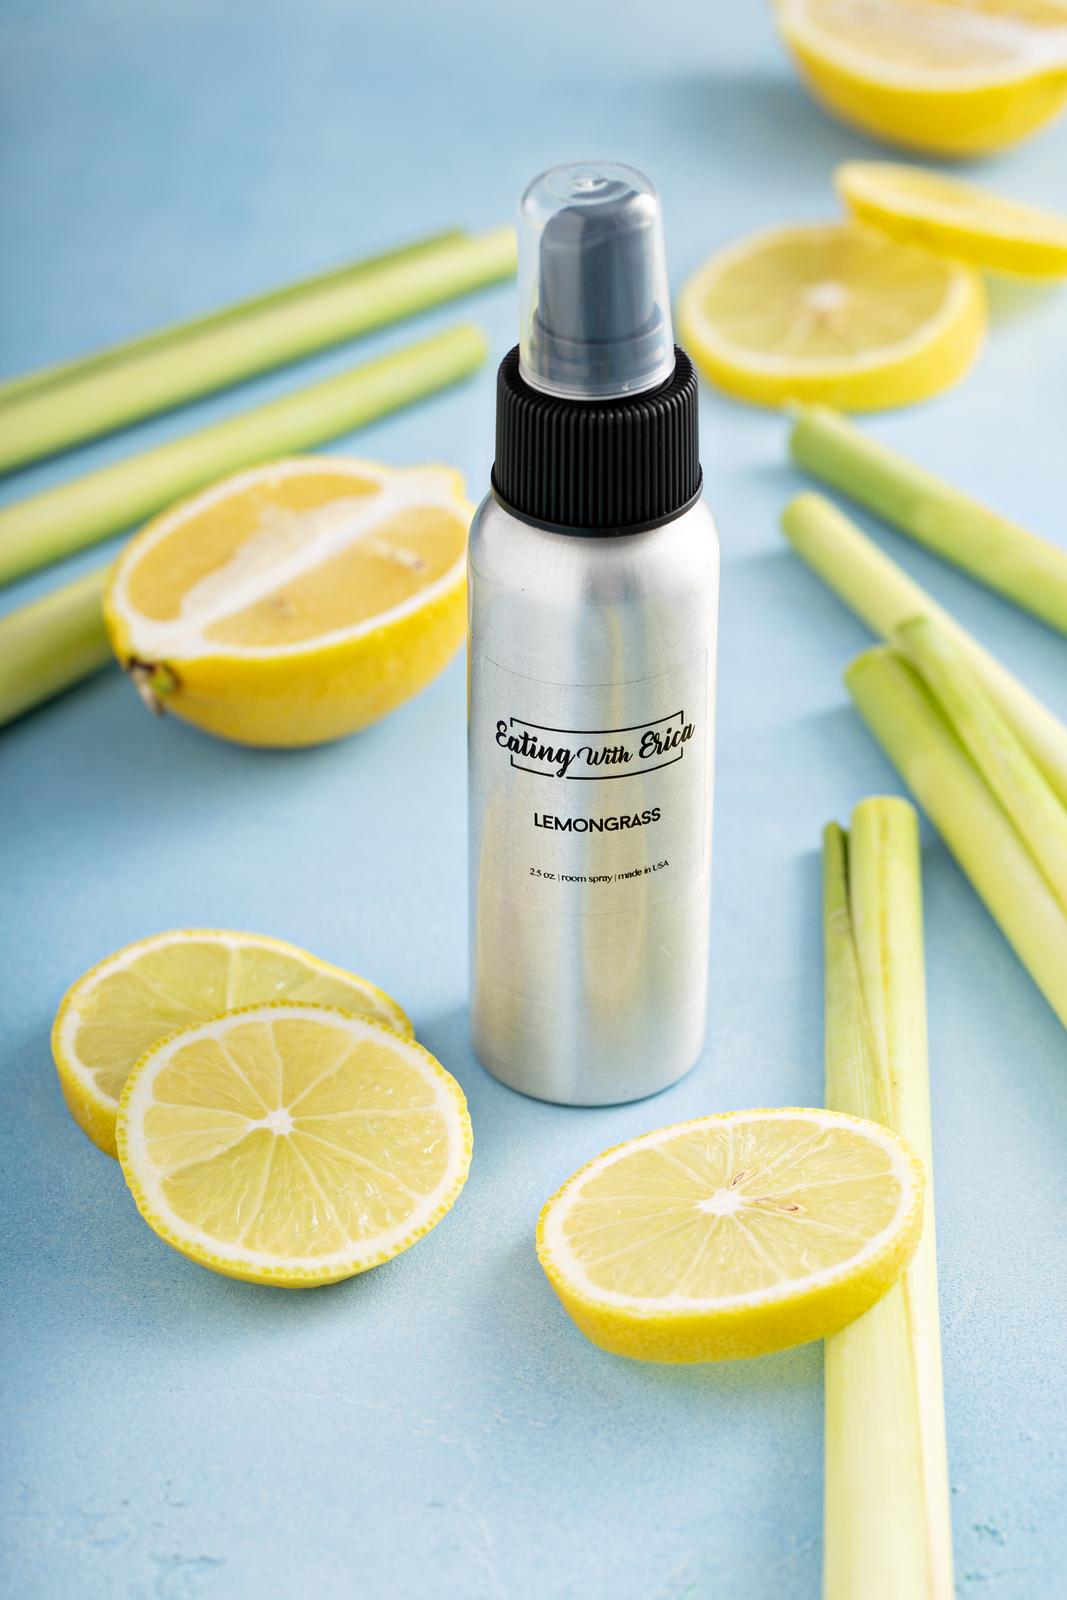 Lemongrass Room Spray